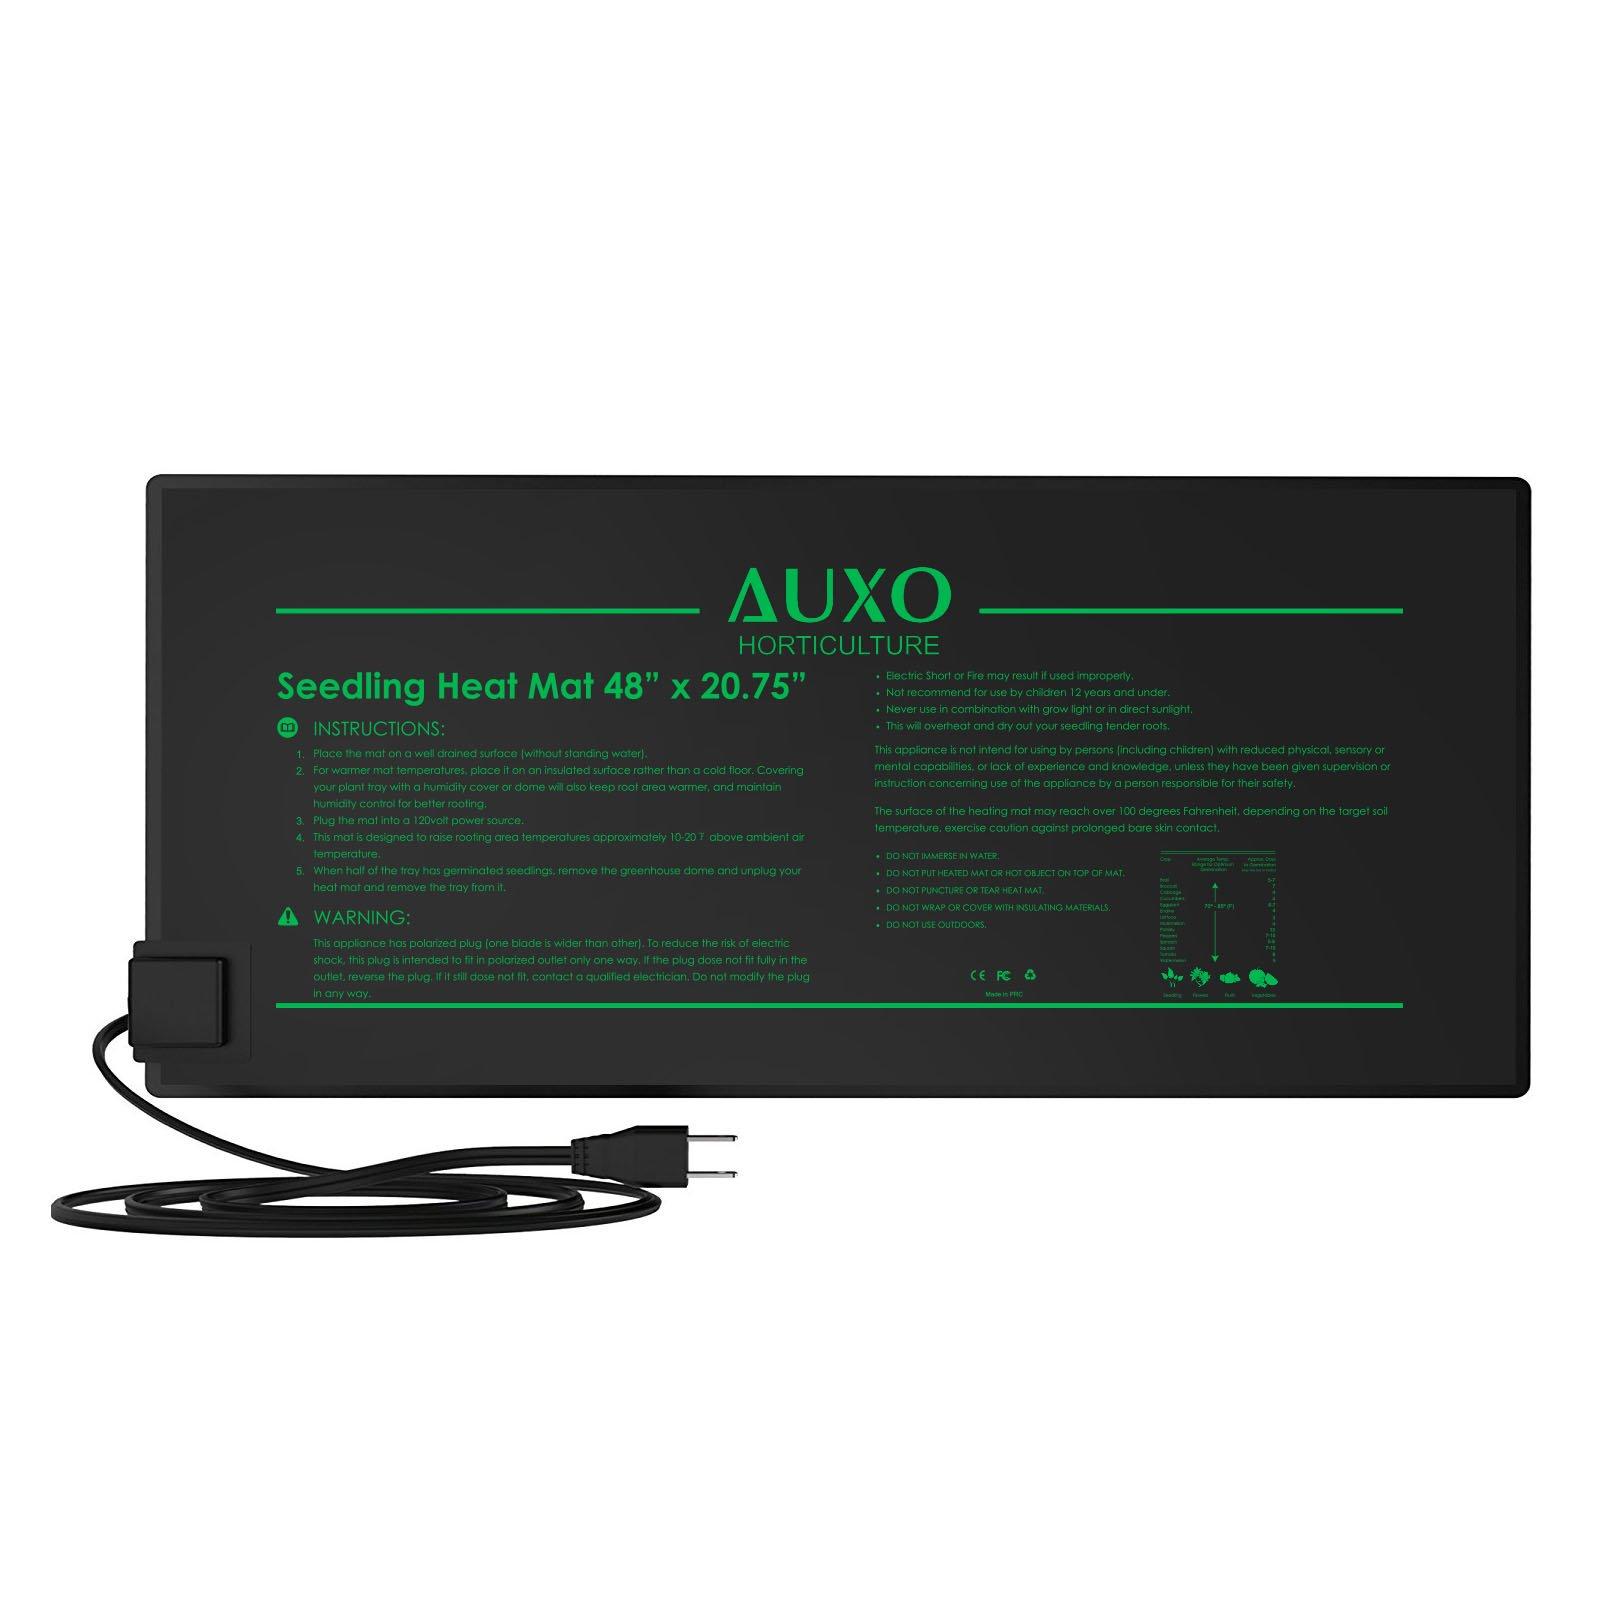 Auxo Horticulture 48'' x 20.75'' Multifunction Waterproof Seedling Heat Mat Warm Heating Pad